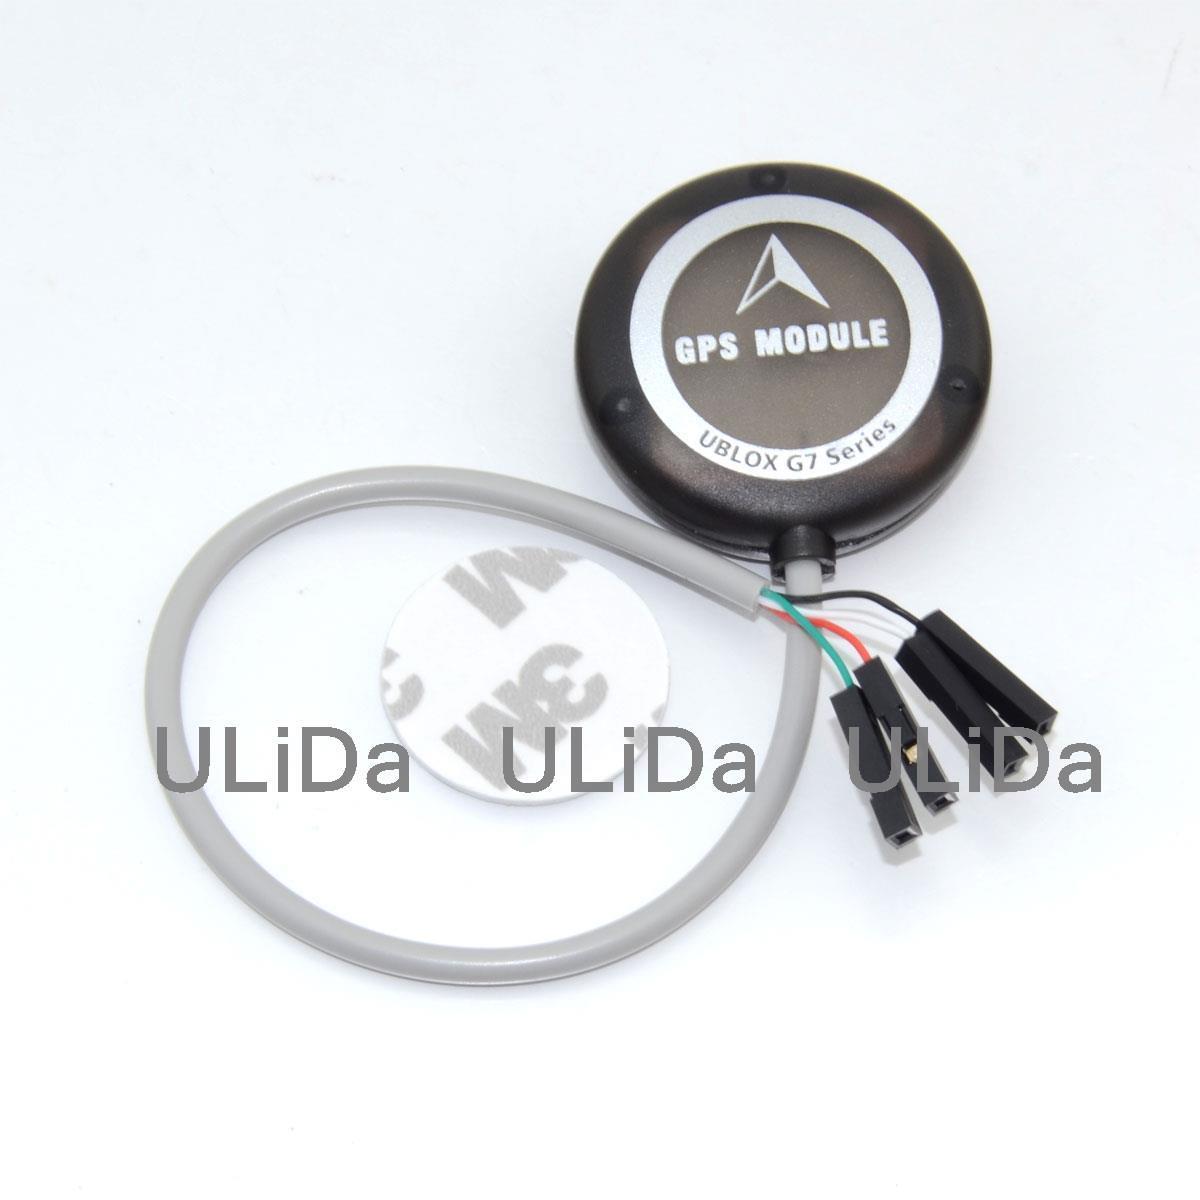 Mini Ublox G7 Series GPS Module with Shell for Naze Flight Controller QAV250 ublox m8n gps compatible with naza lite v1 v2 flight controller